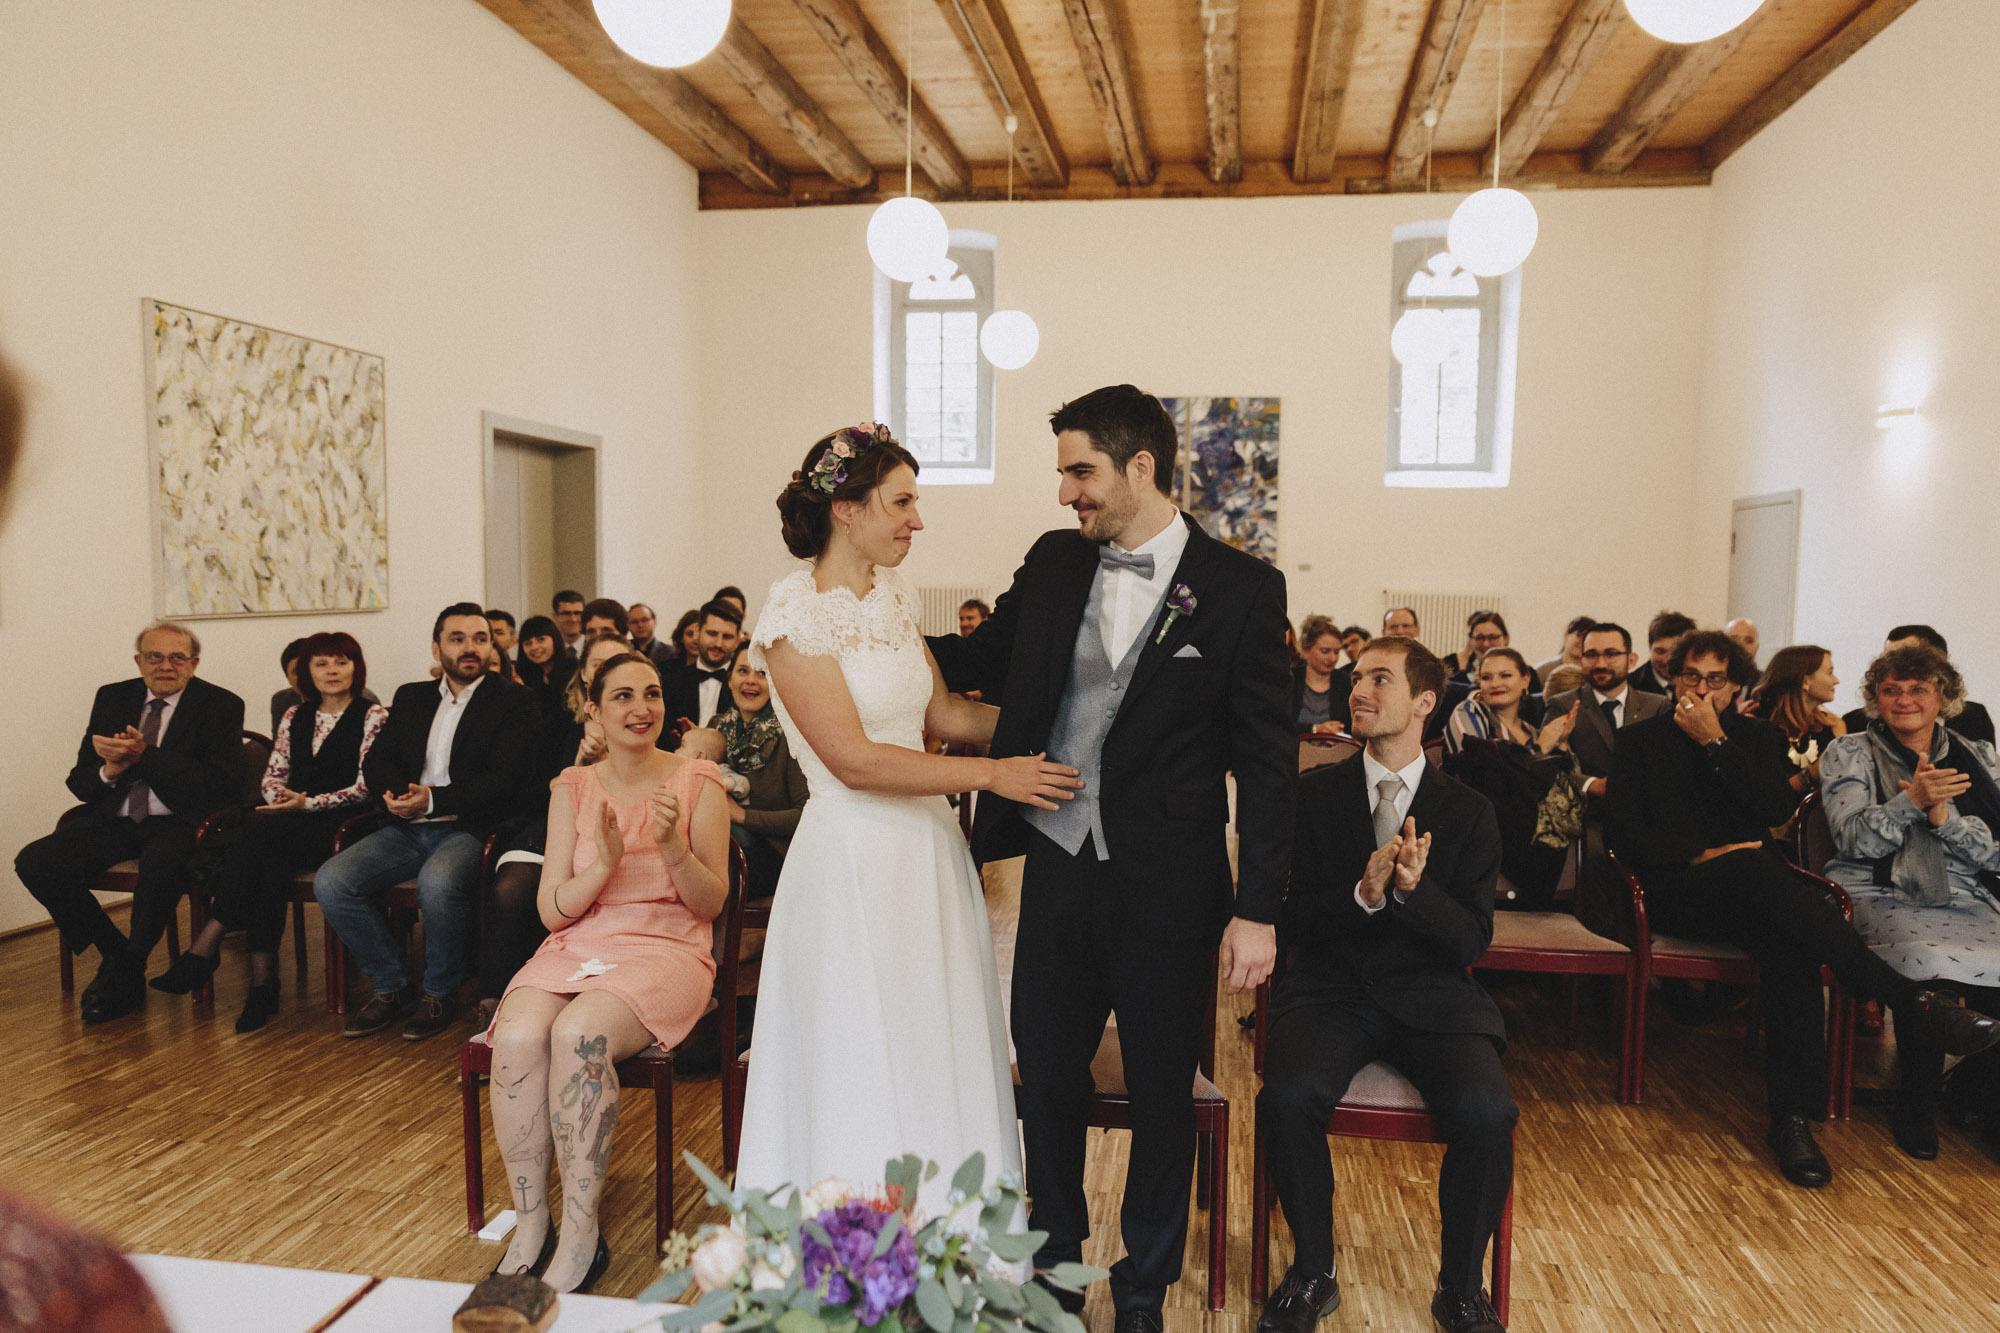 Hochzeitsfotografie-Karlsruhe-Ronja-Flo-4